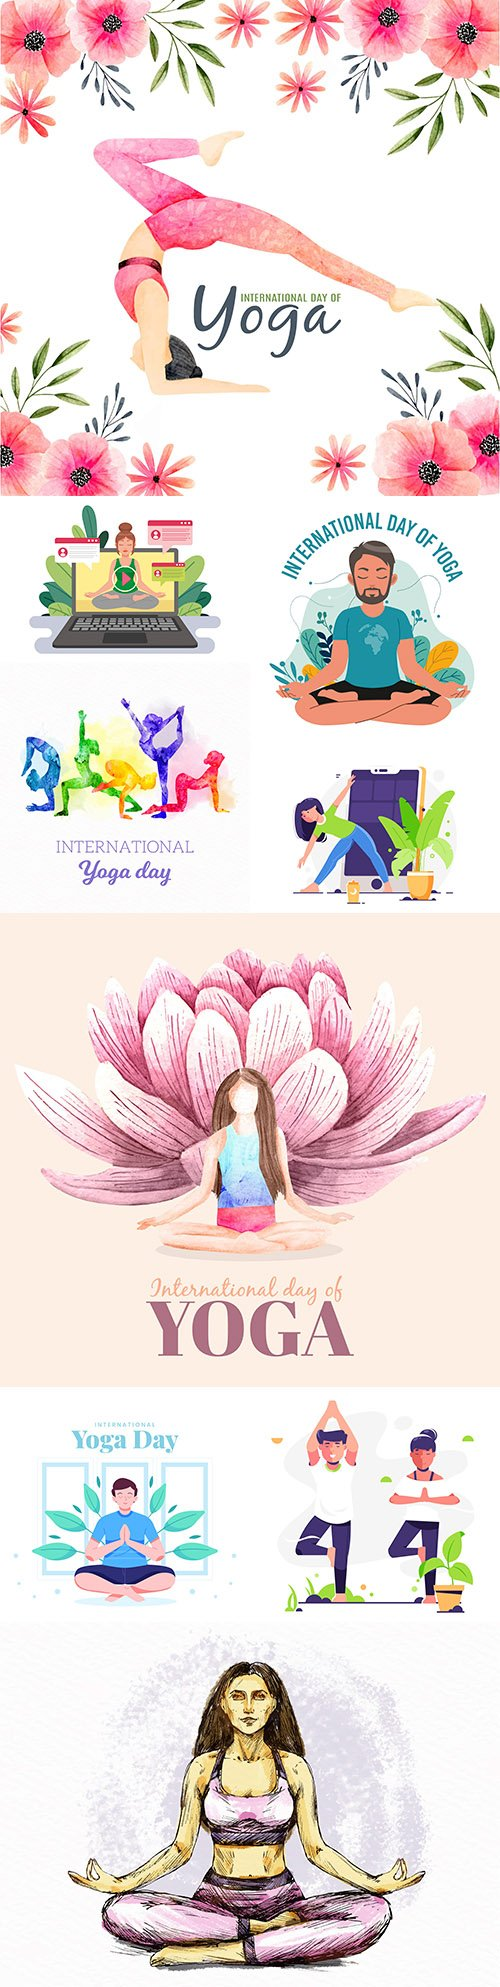 Yoga International day and meditation design illustration 5